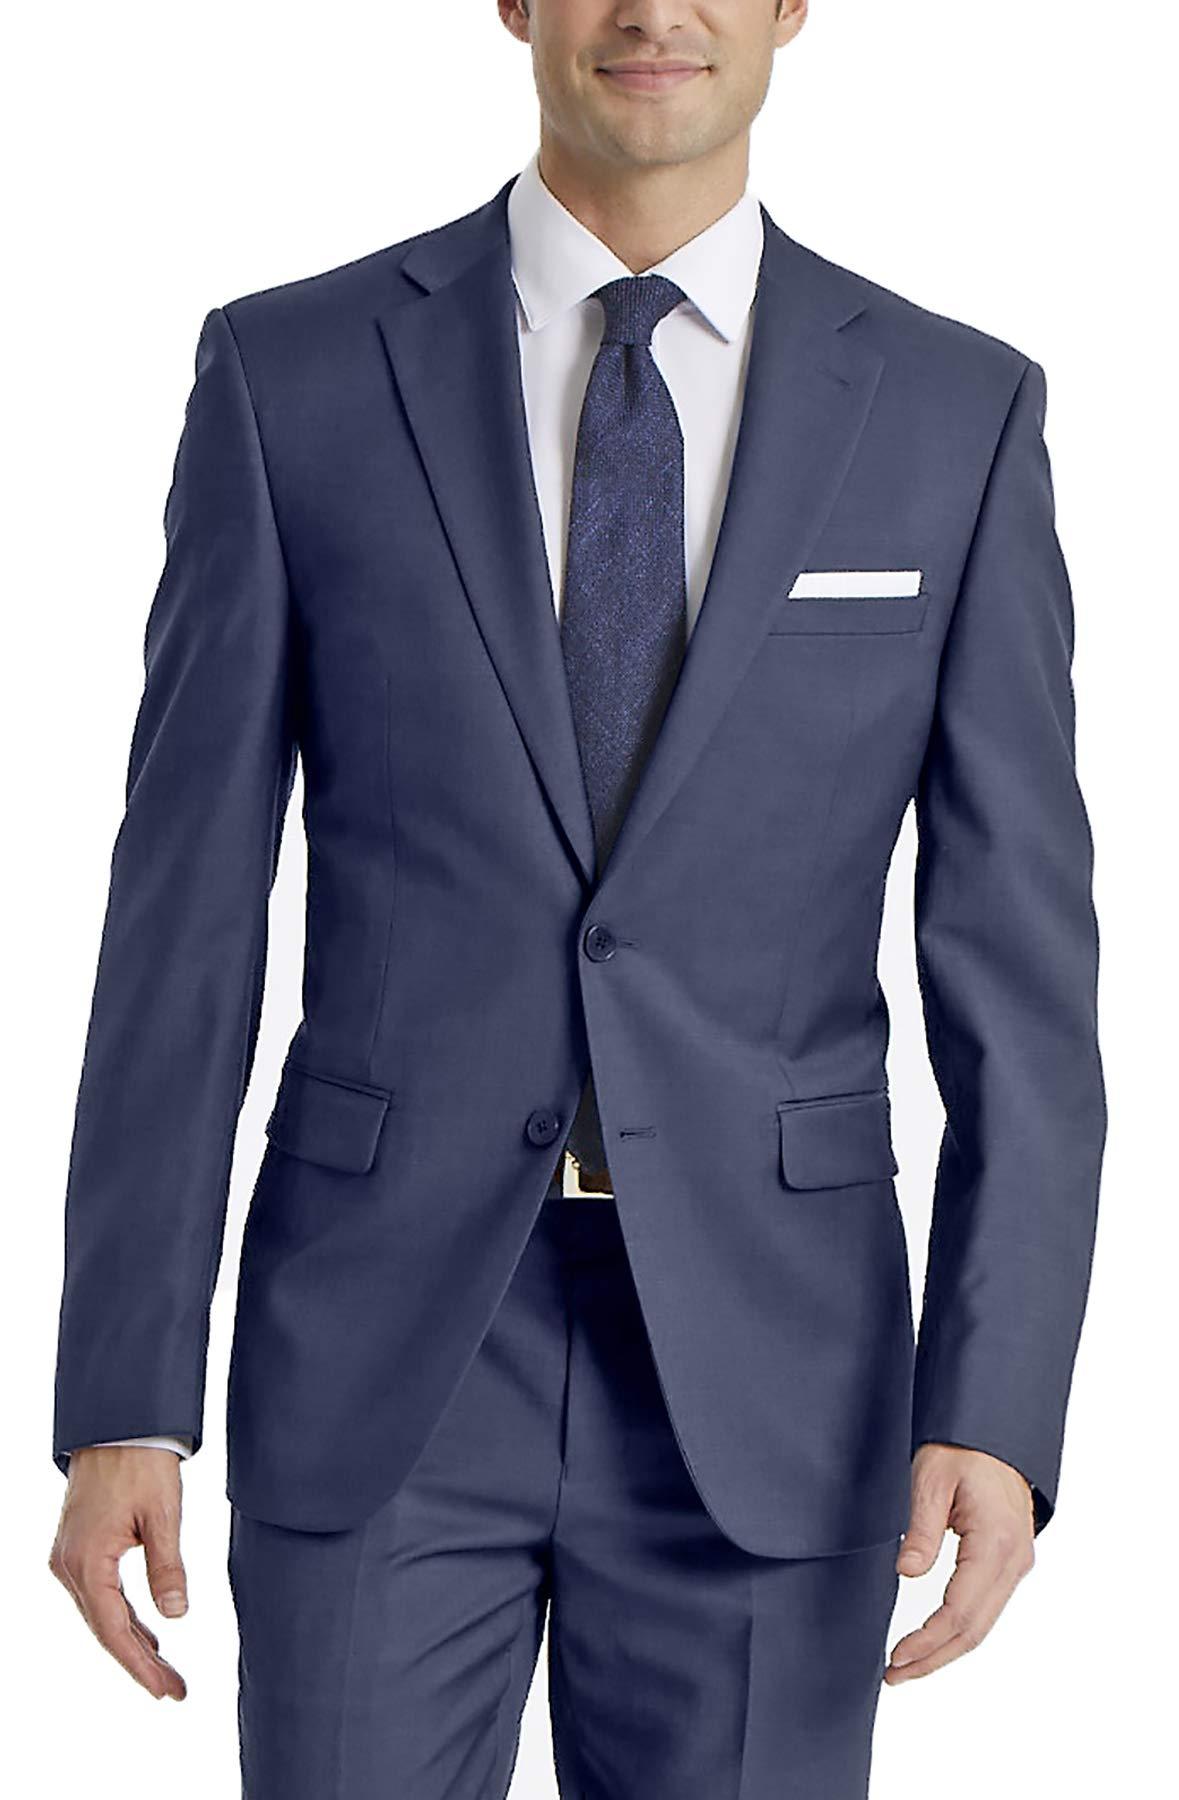 Calvin Klein Men's X-Fit Slim Stretch Suit Separate Blazer (Blazer and Pant), Blue, 40 Short